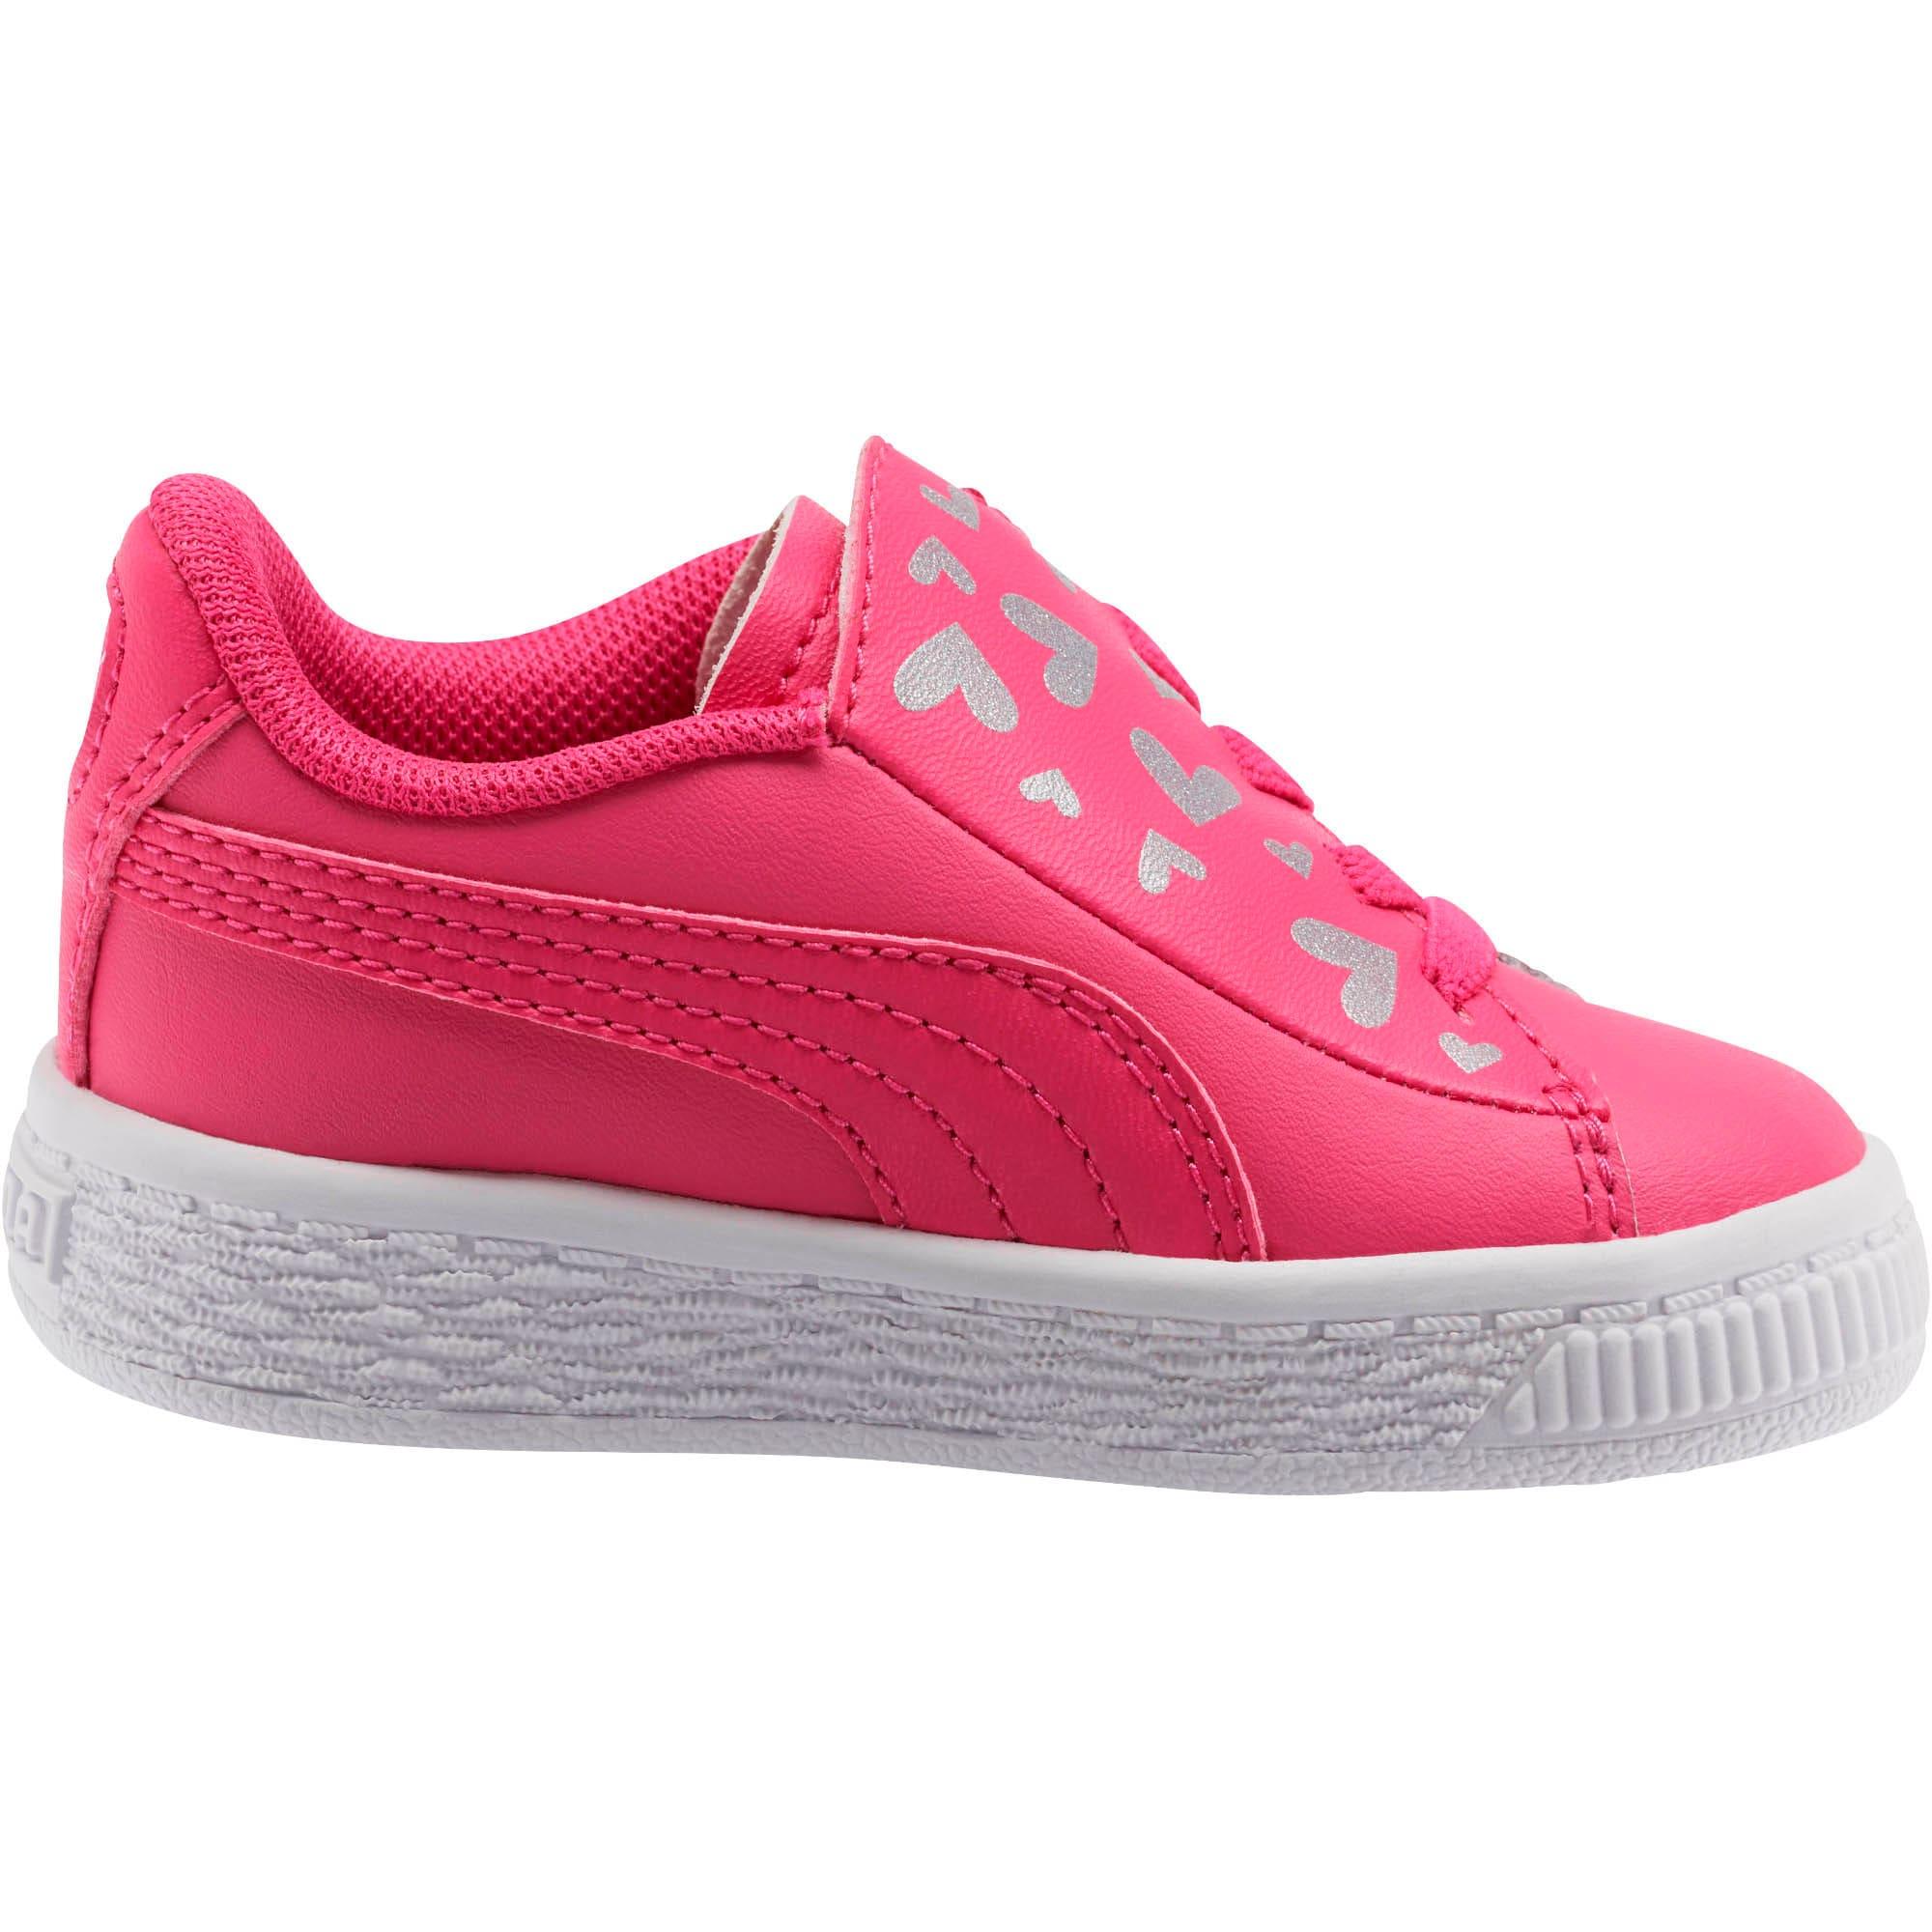 Thumbnail 5 of Basket Crush Glitter Hearts AC Toddler Shoes, Fuchsia Purple-Puma White, medium